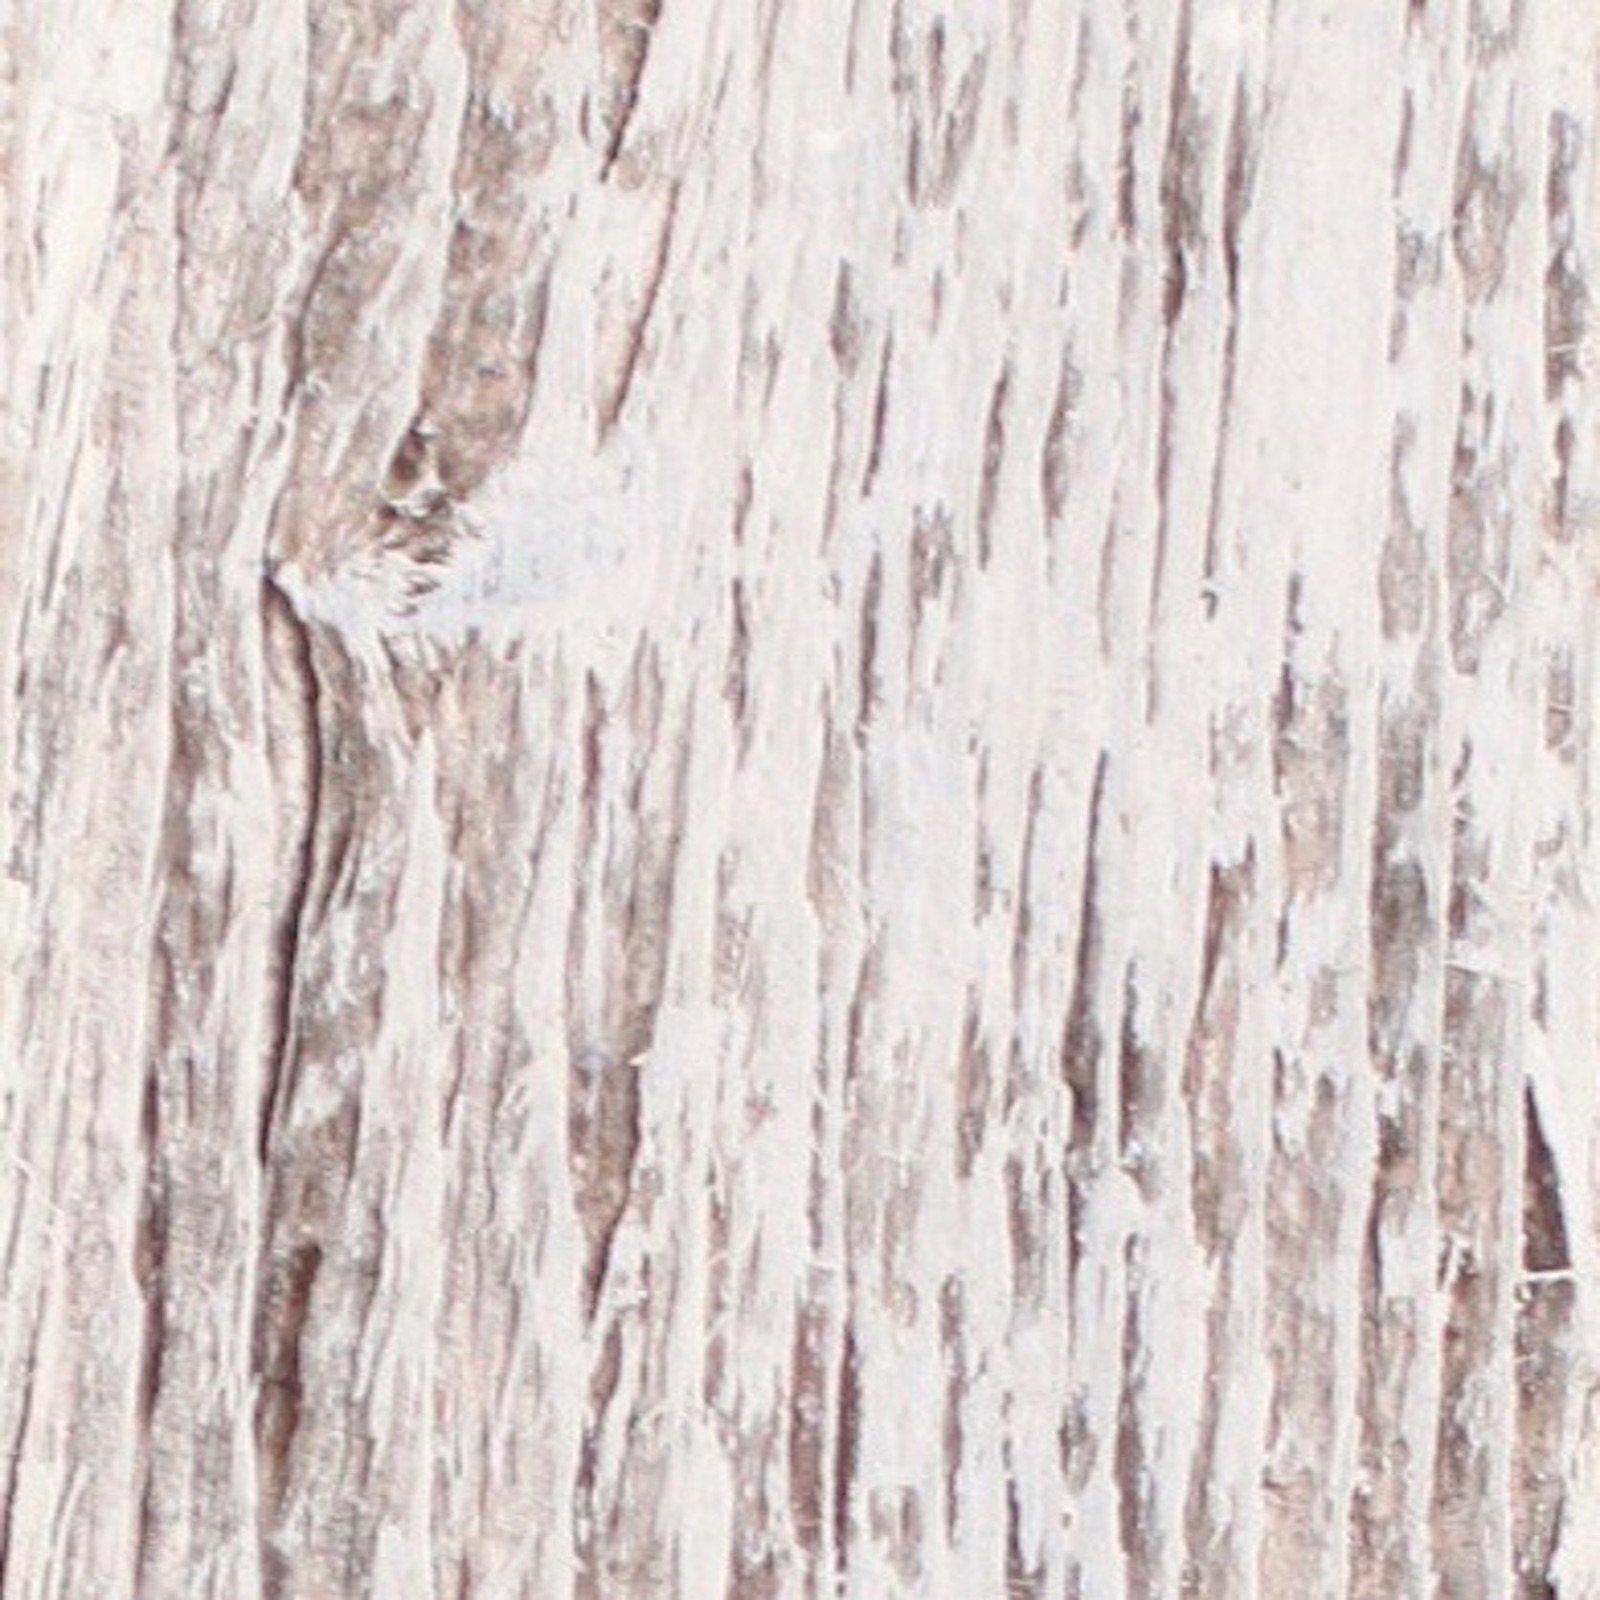 BarnwoodUSA Decorative Cross, Rustic Christian Home Decor, Recycled Wood (White Wash) by BarnwoodUSA